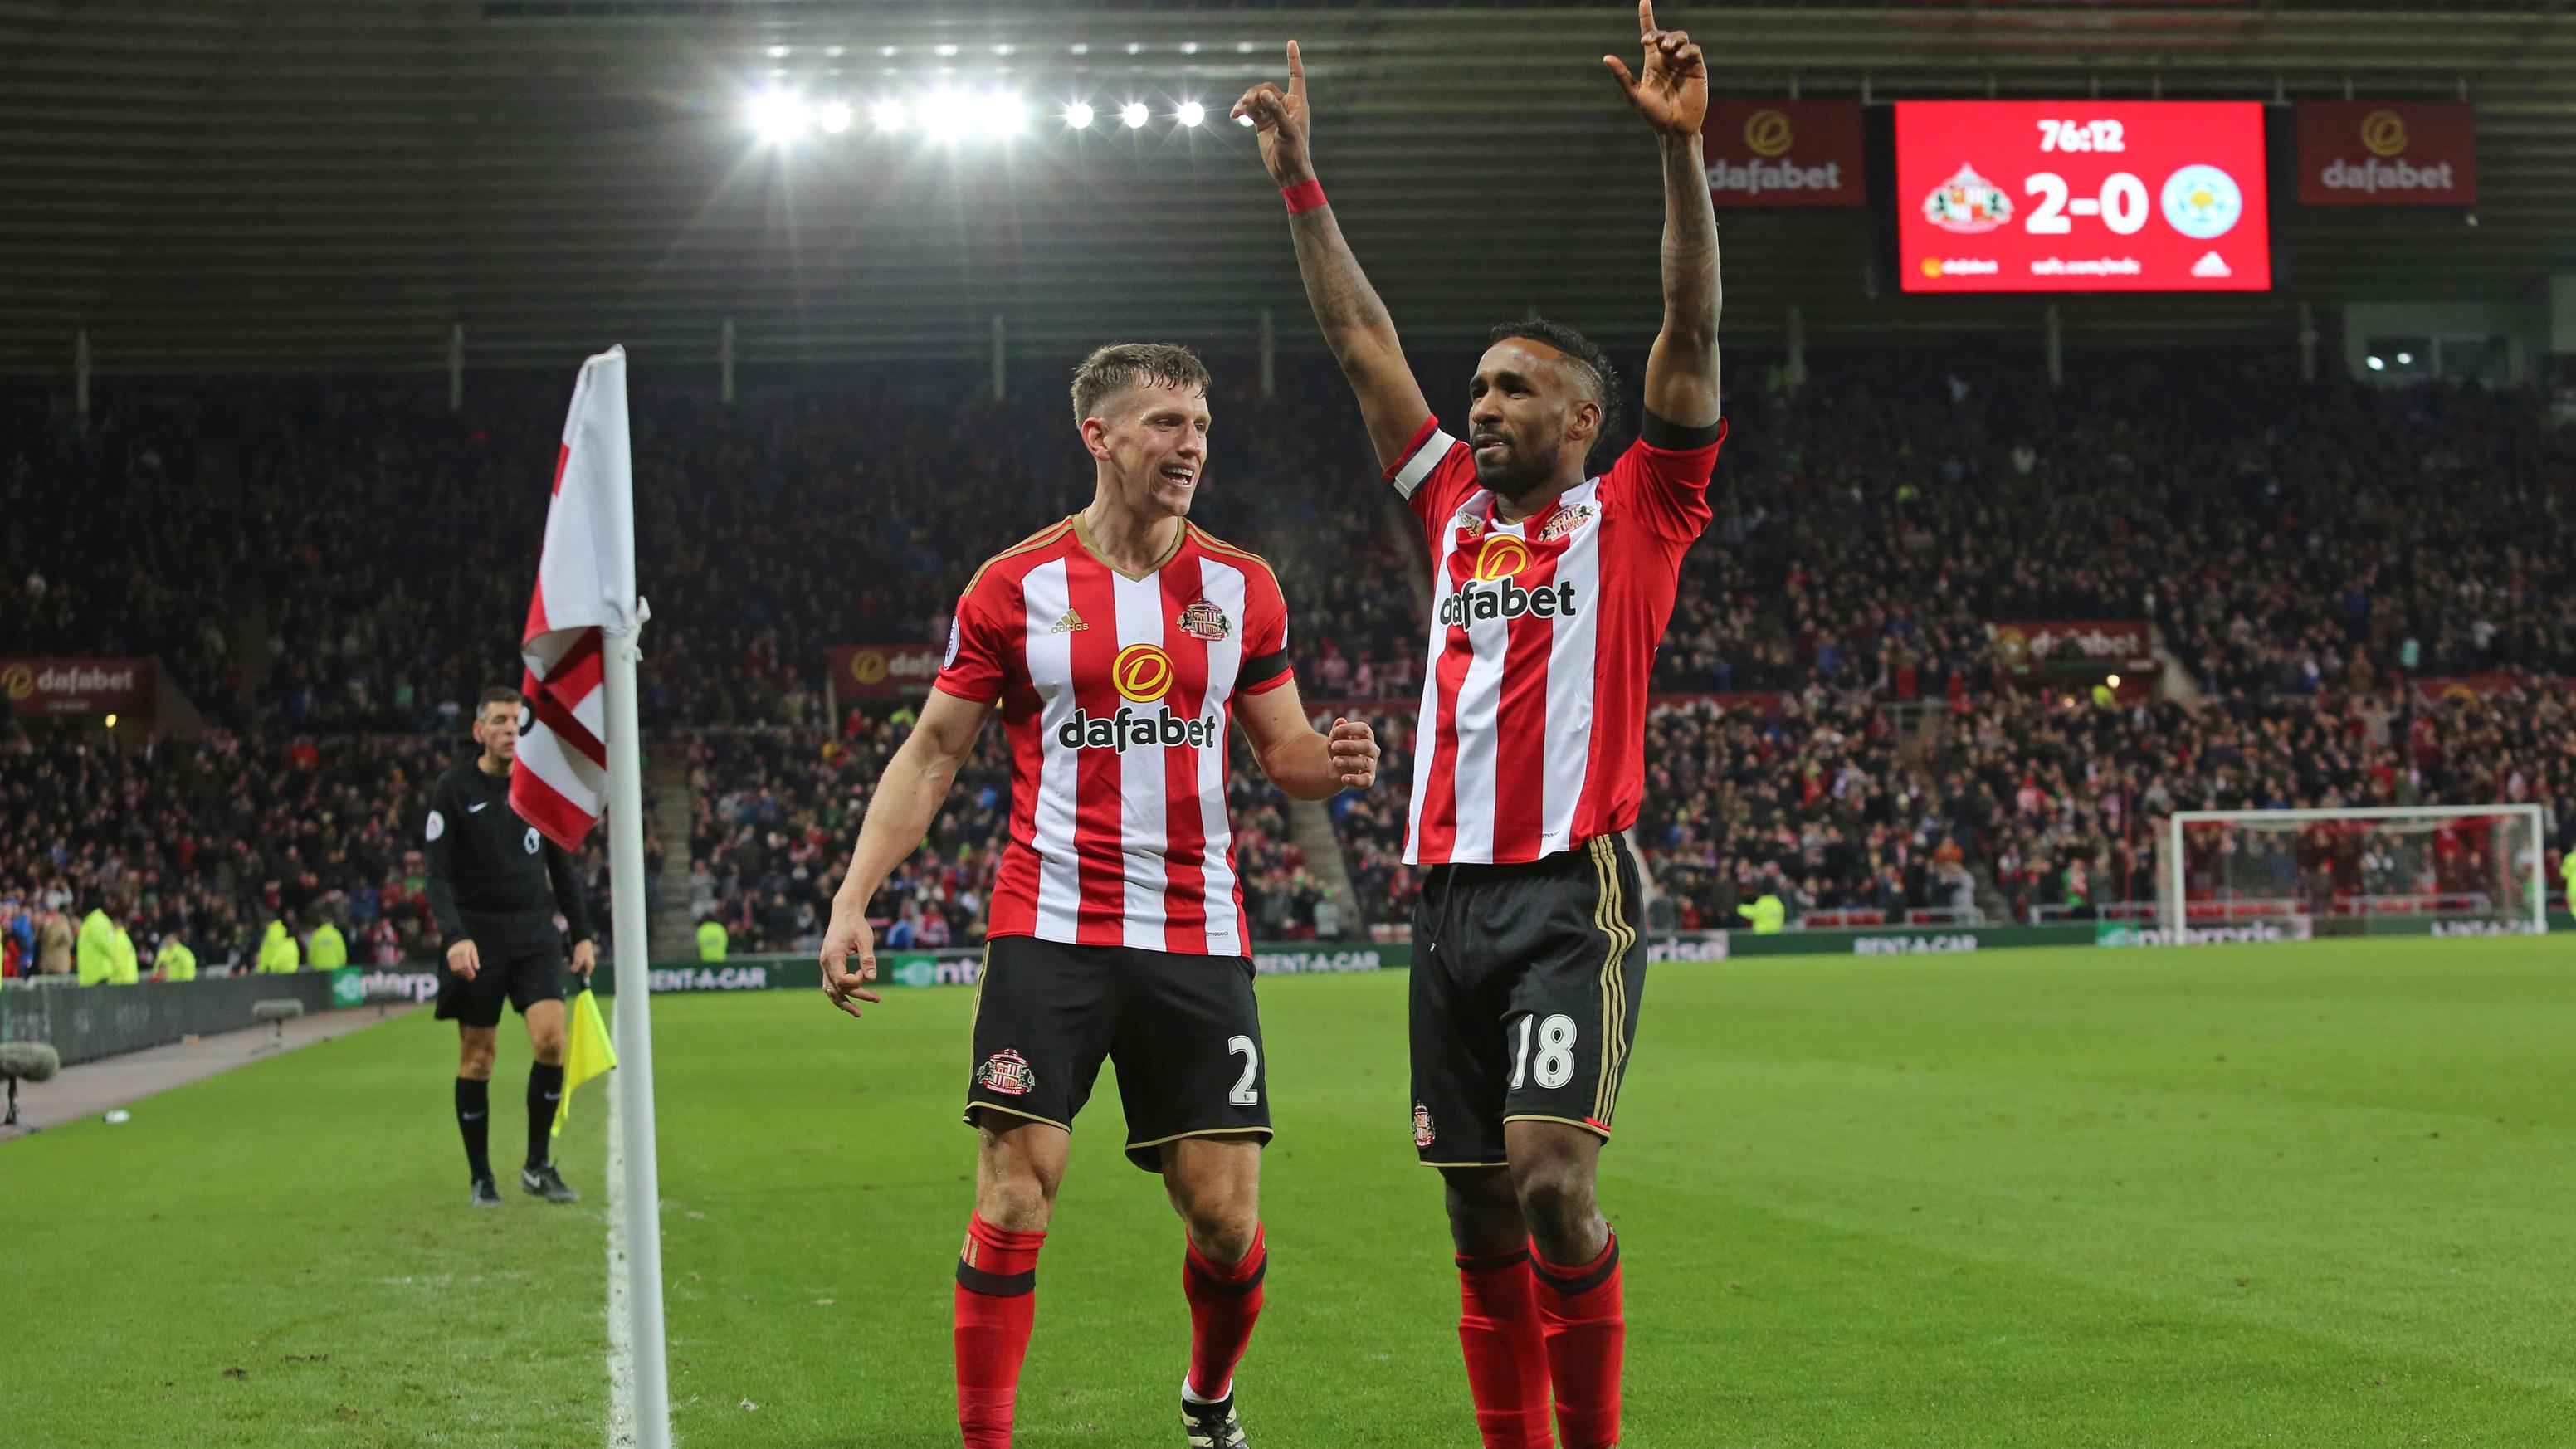 Jones and Defoe celebrate